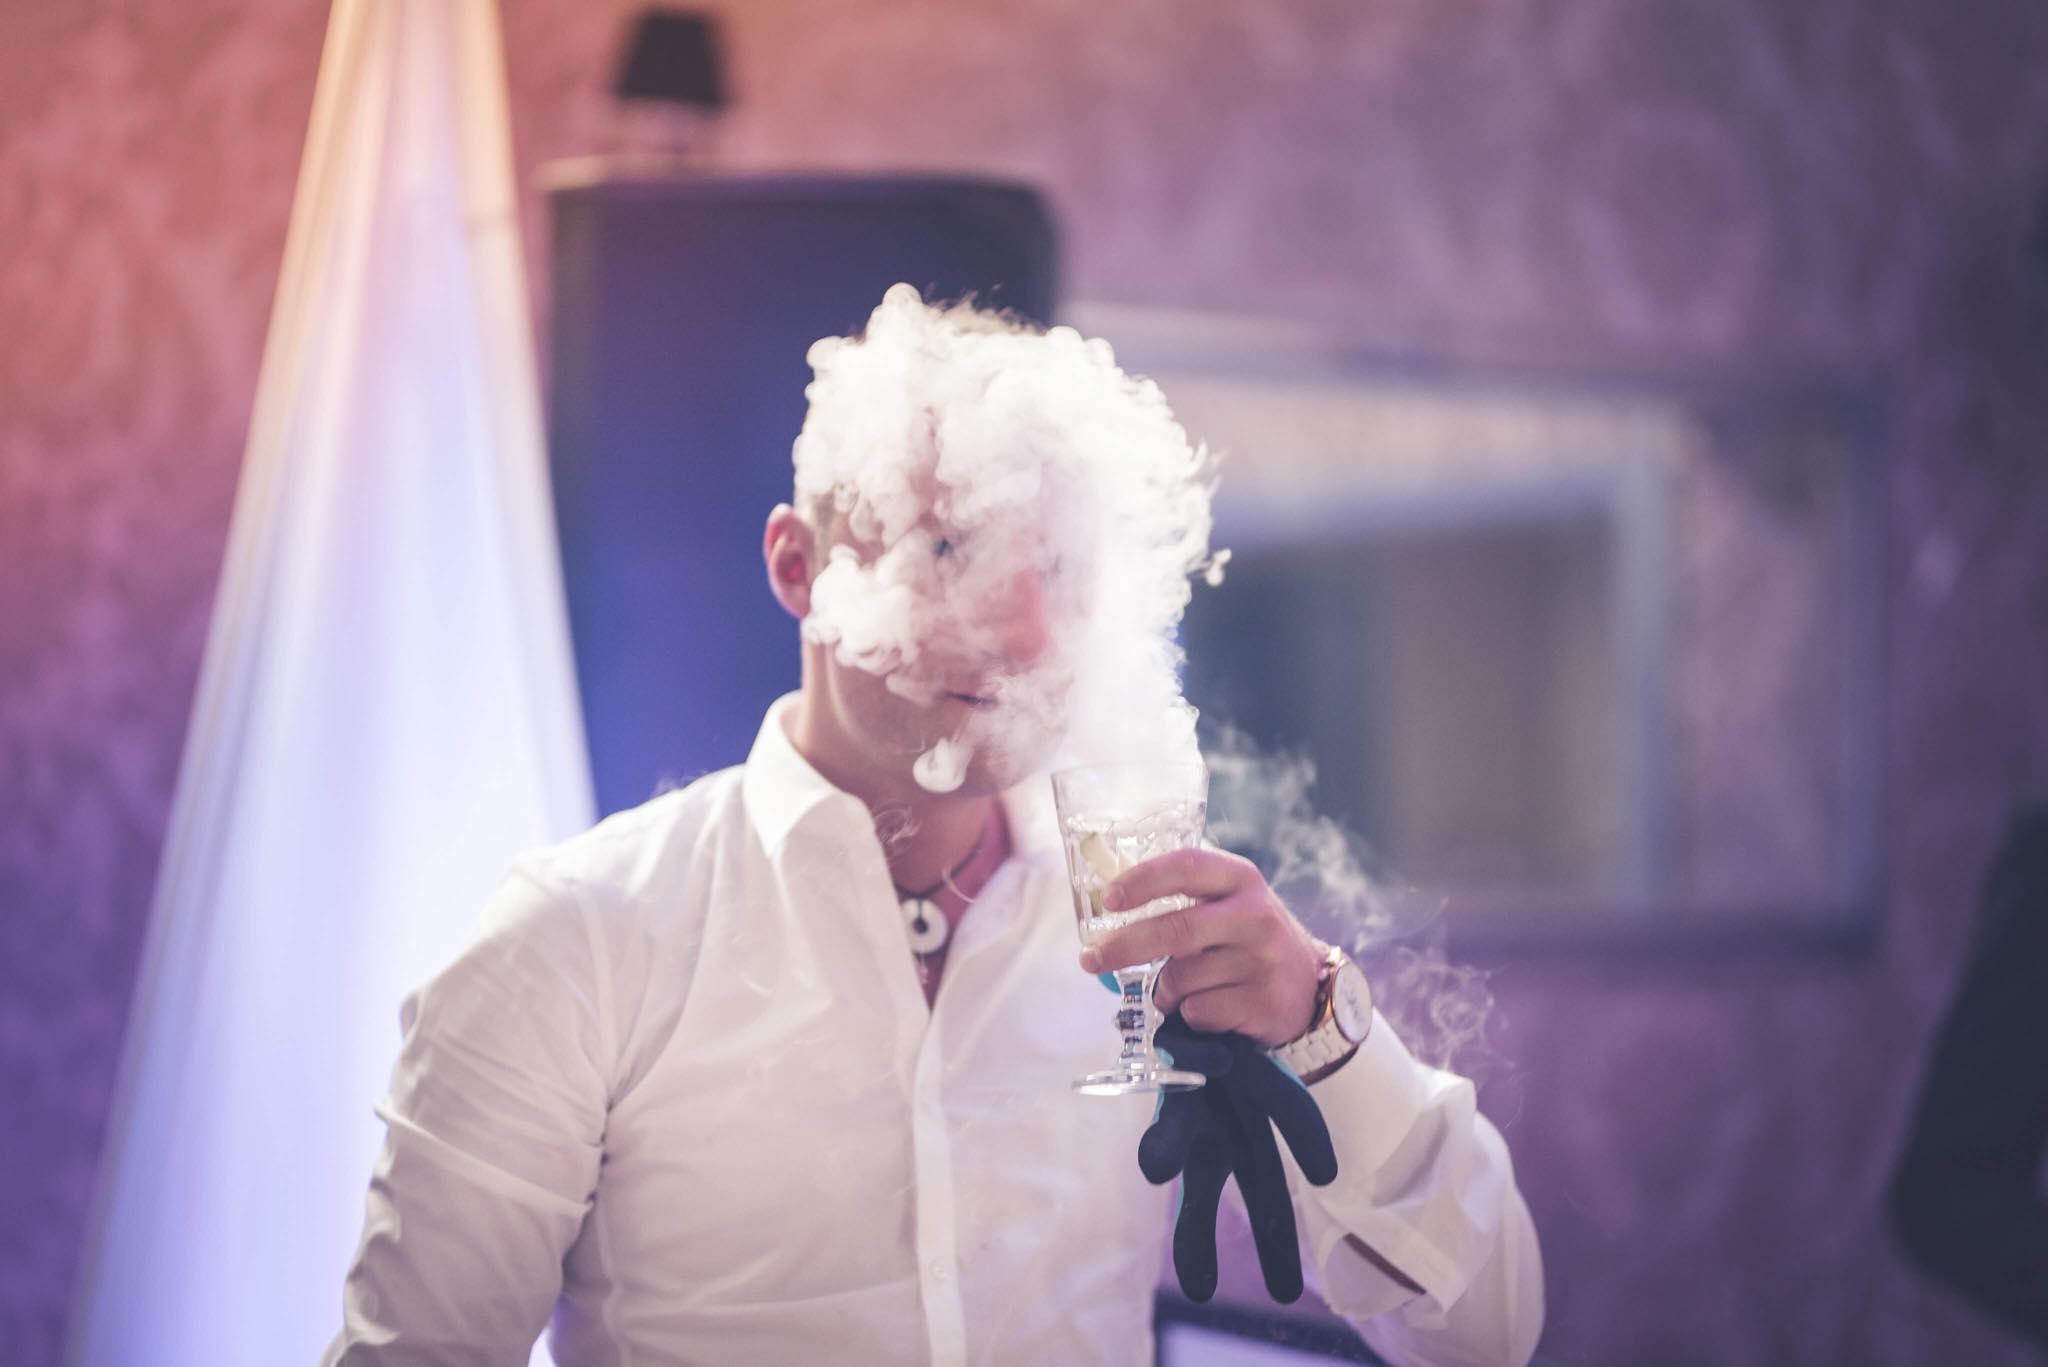 Suchy lód, parujące drinki, ciężki dym